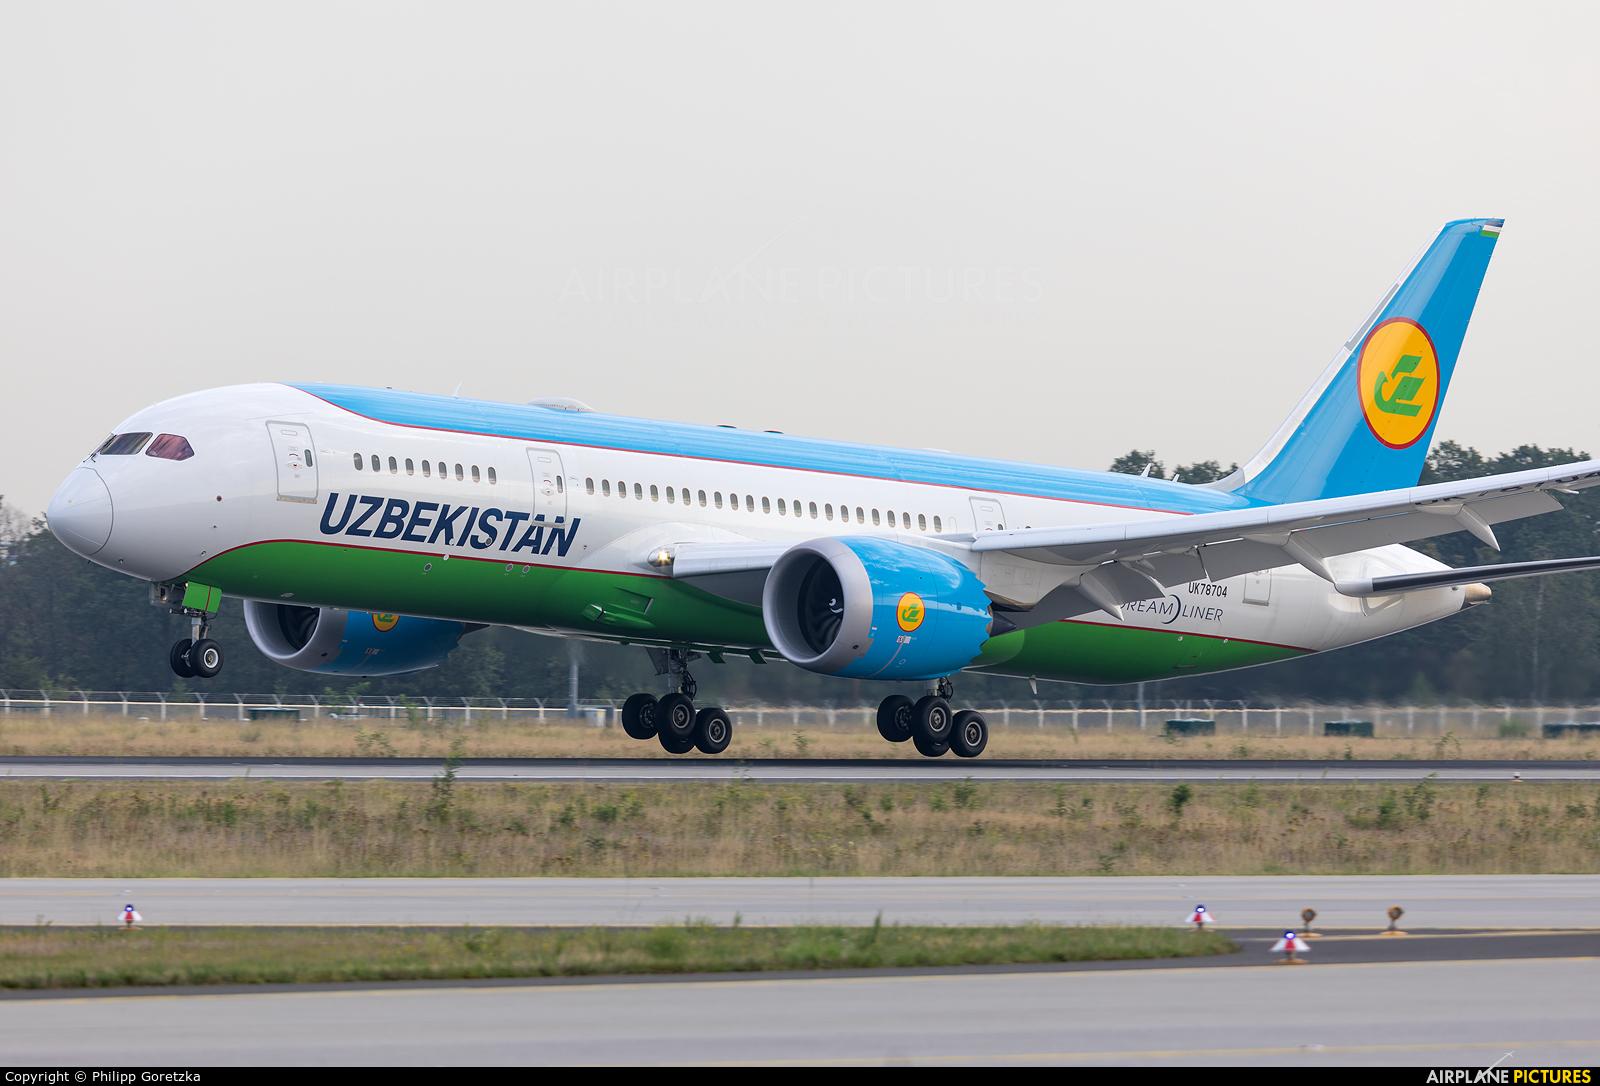 Uzbekistan Airways UK78704 aircraft at Frankfurt